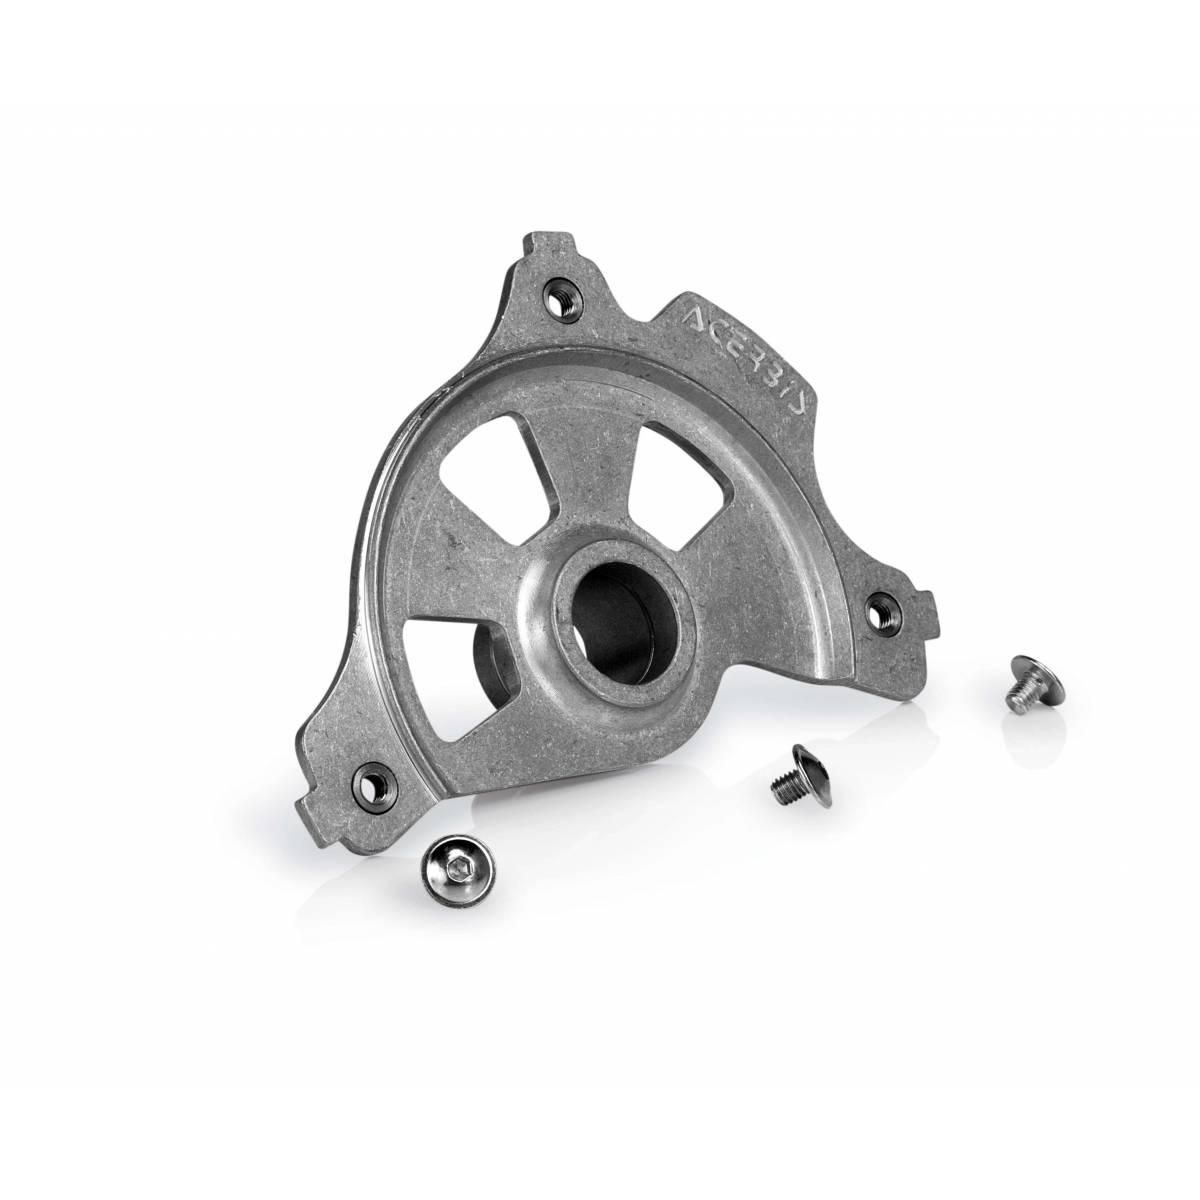 0020080 - Kit Acople Cubredisco Delantero Acerbis Yz125 Yz250